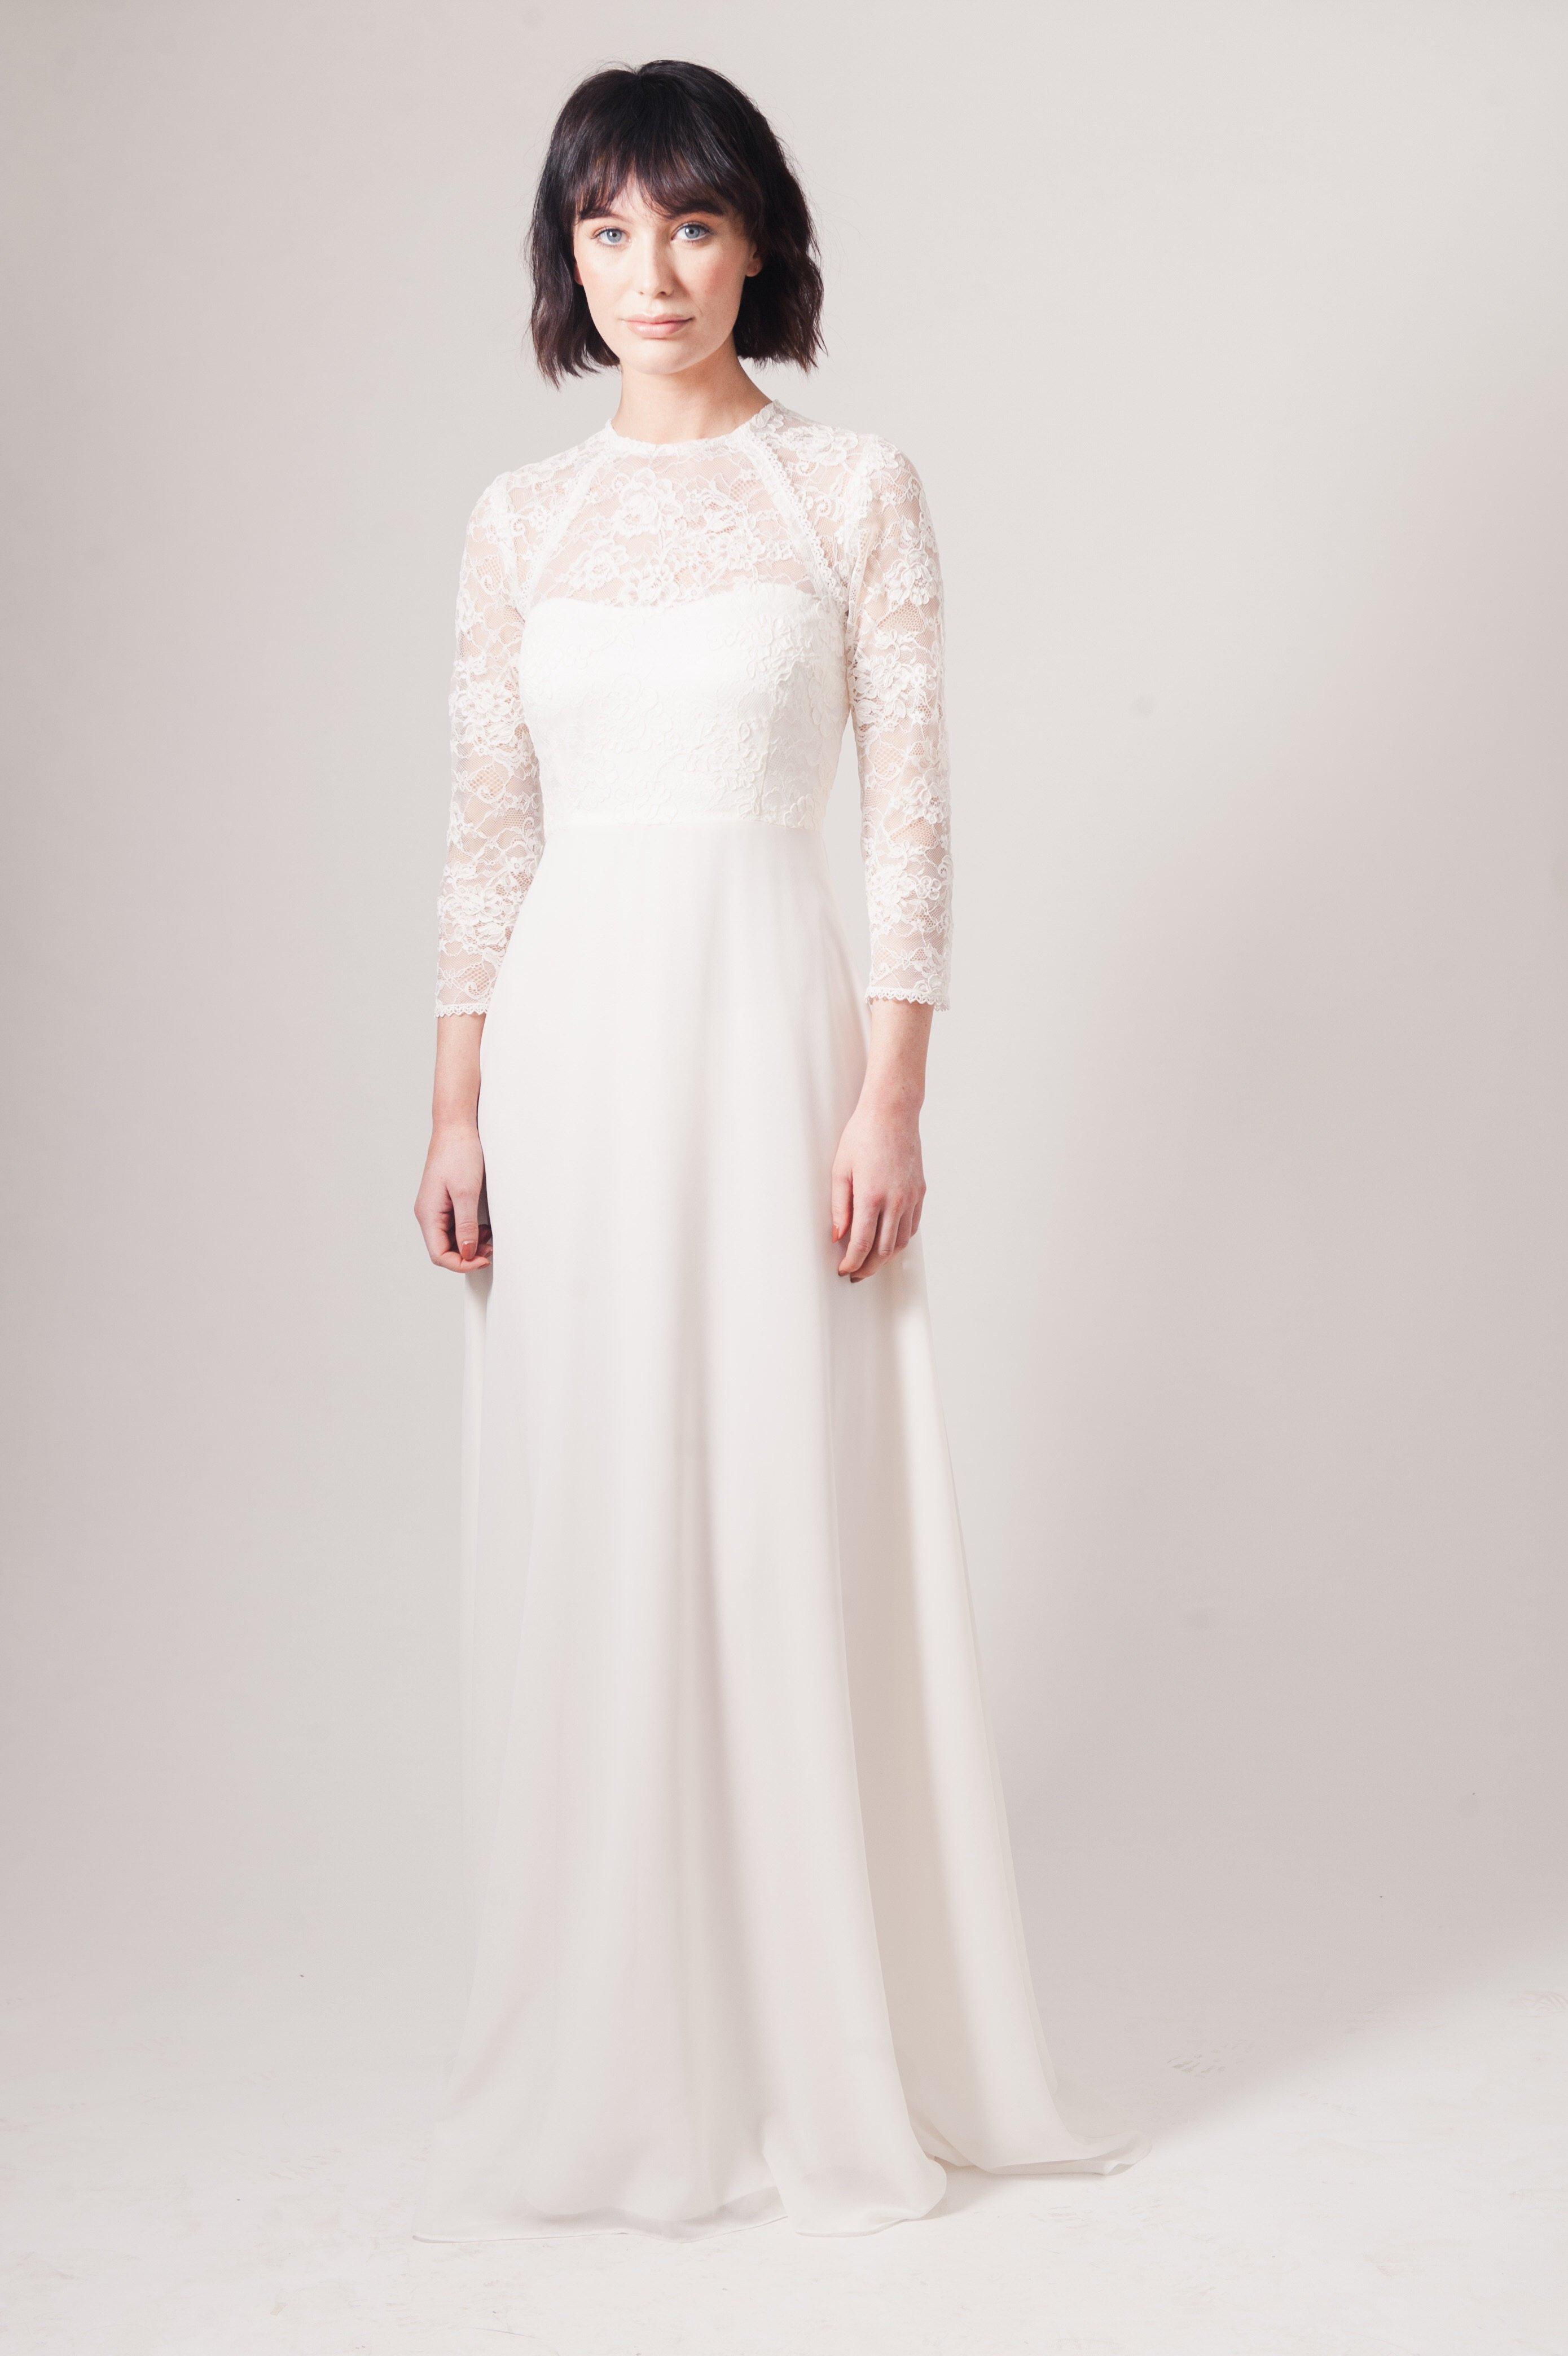 Nachhaltige Hochzeitsplanung: Kleid, Ringe, Schuhe & Co. - heylilahey.